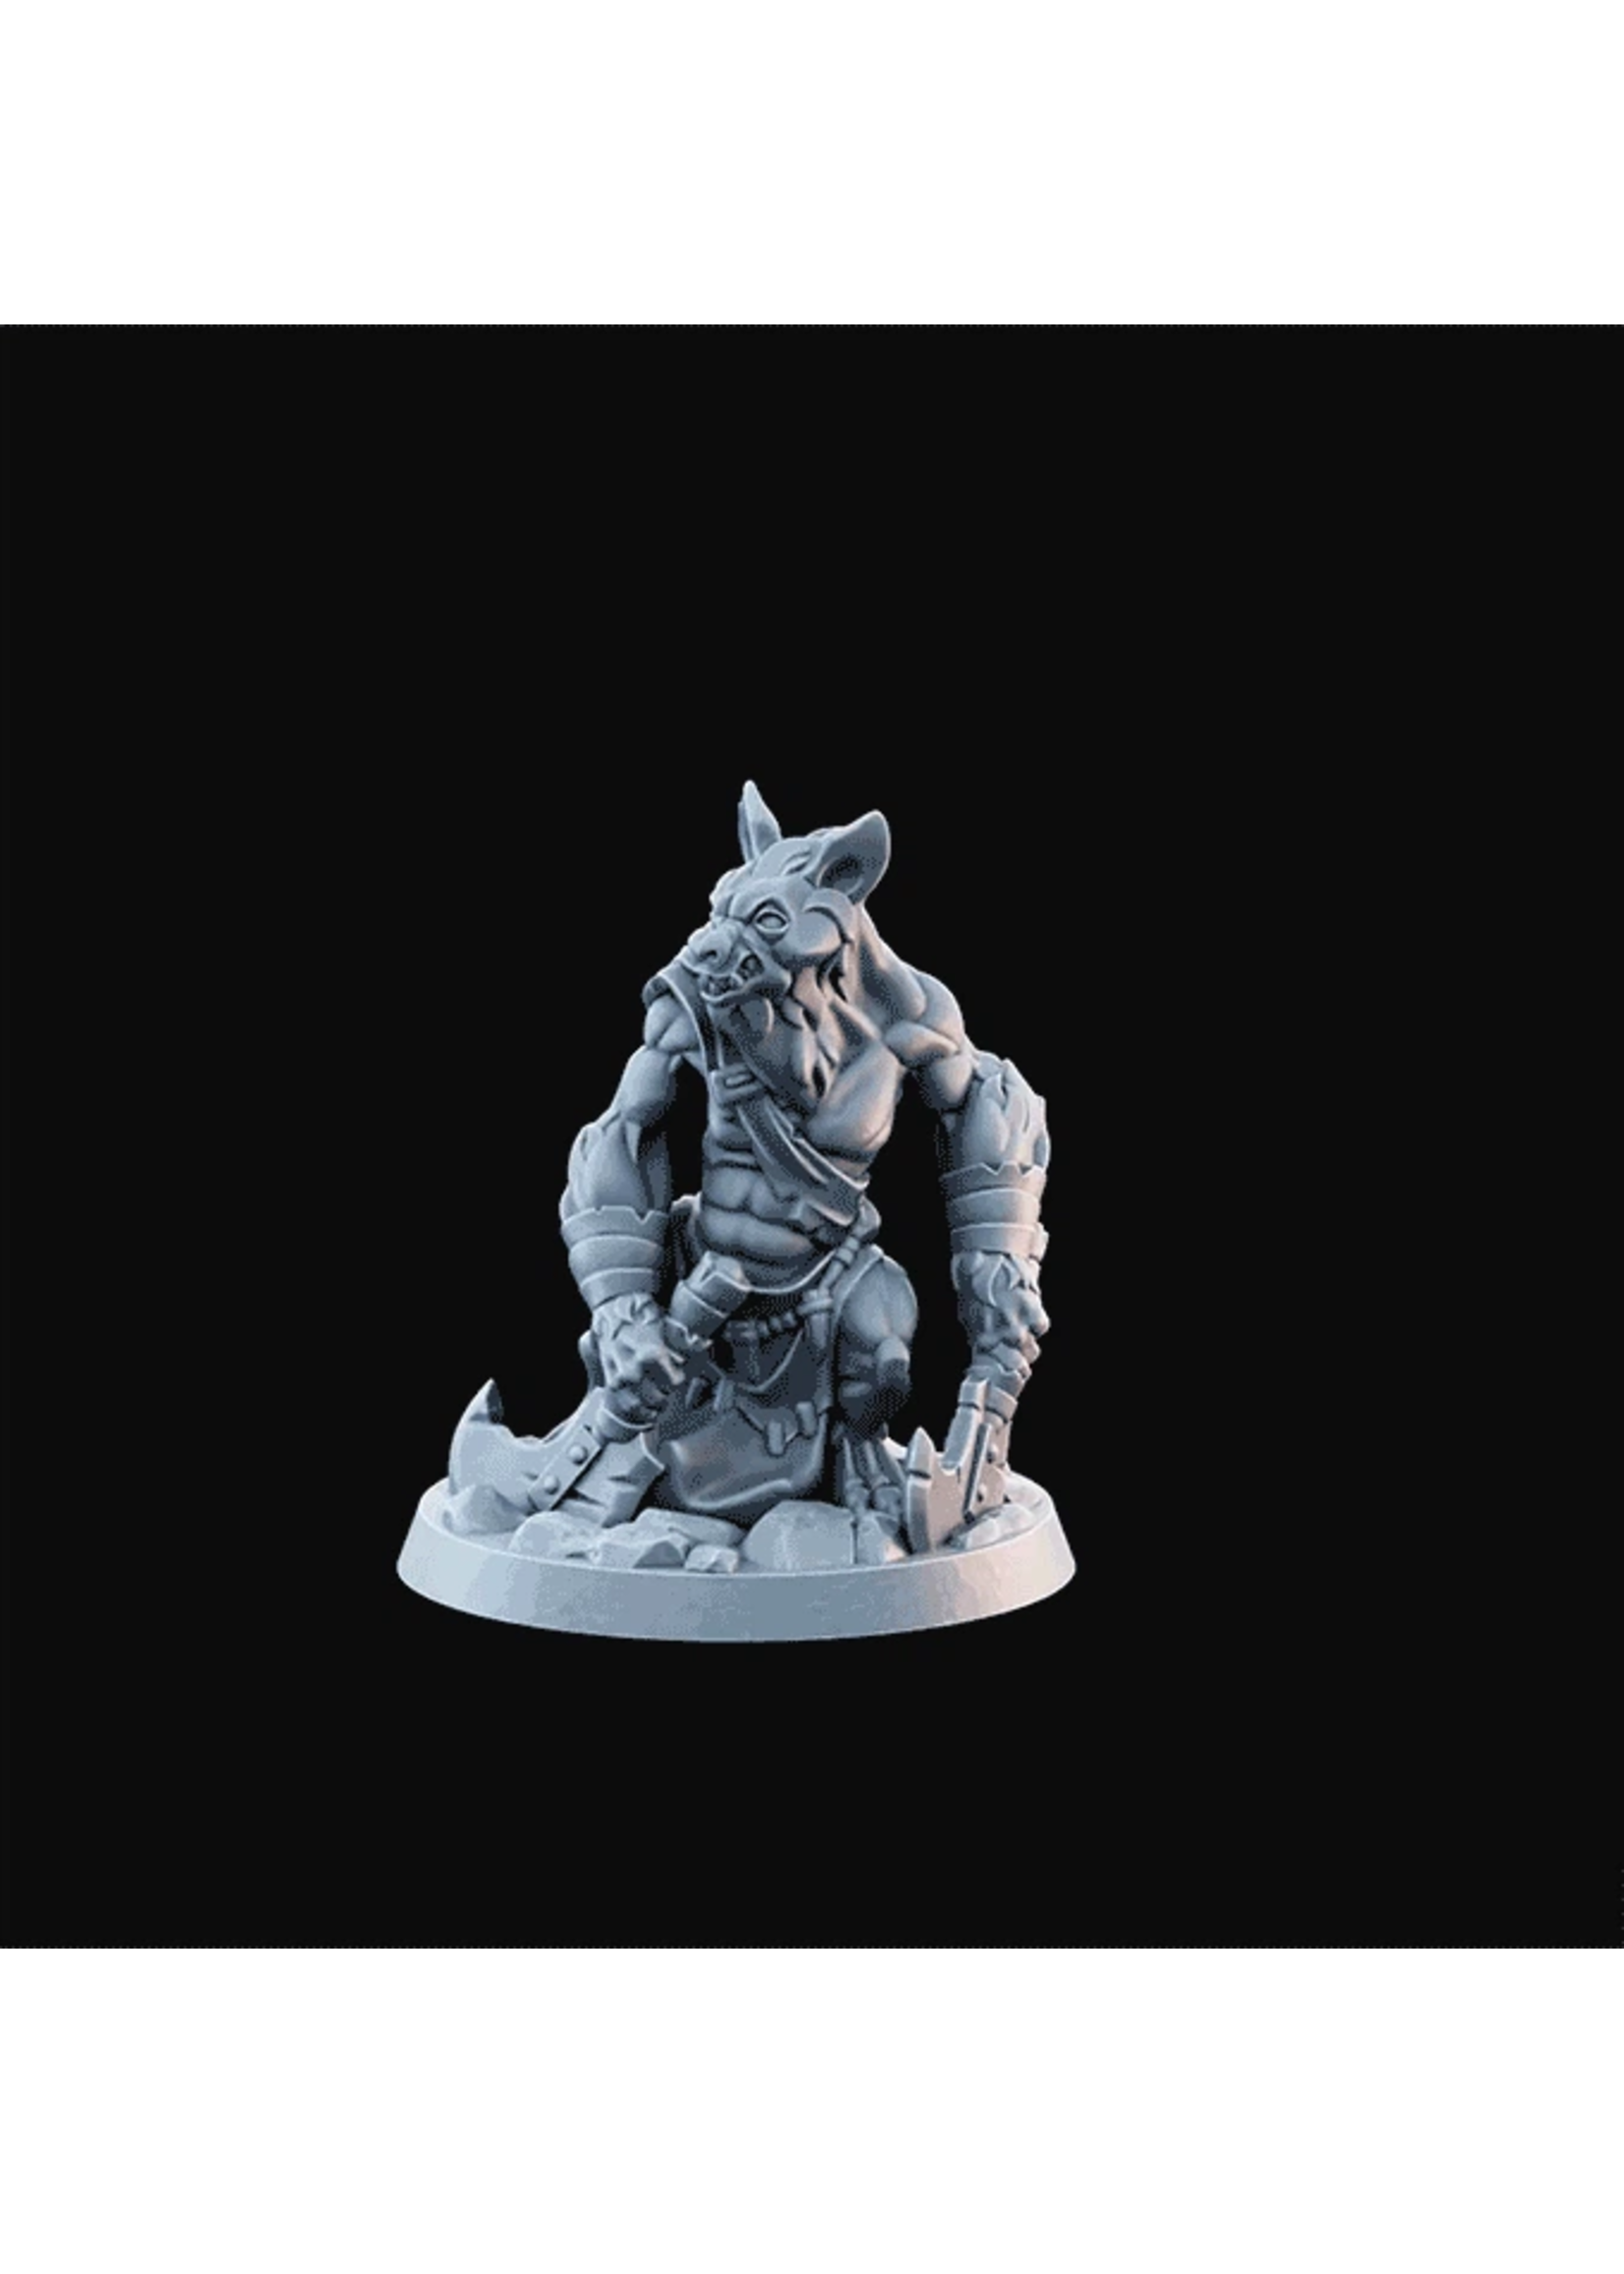 3D Printed Miniature - Hyenaman03  - Dungeons & Dragons - Desolate Plains KS